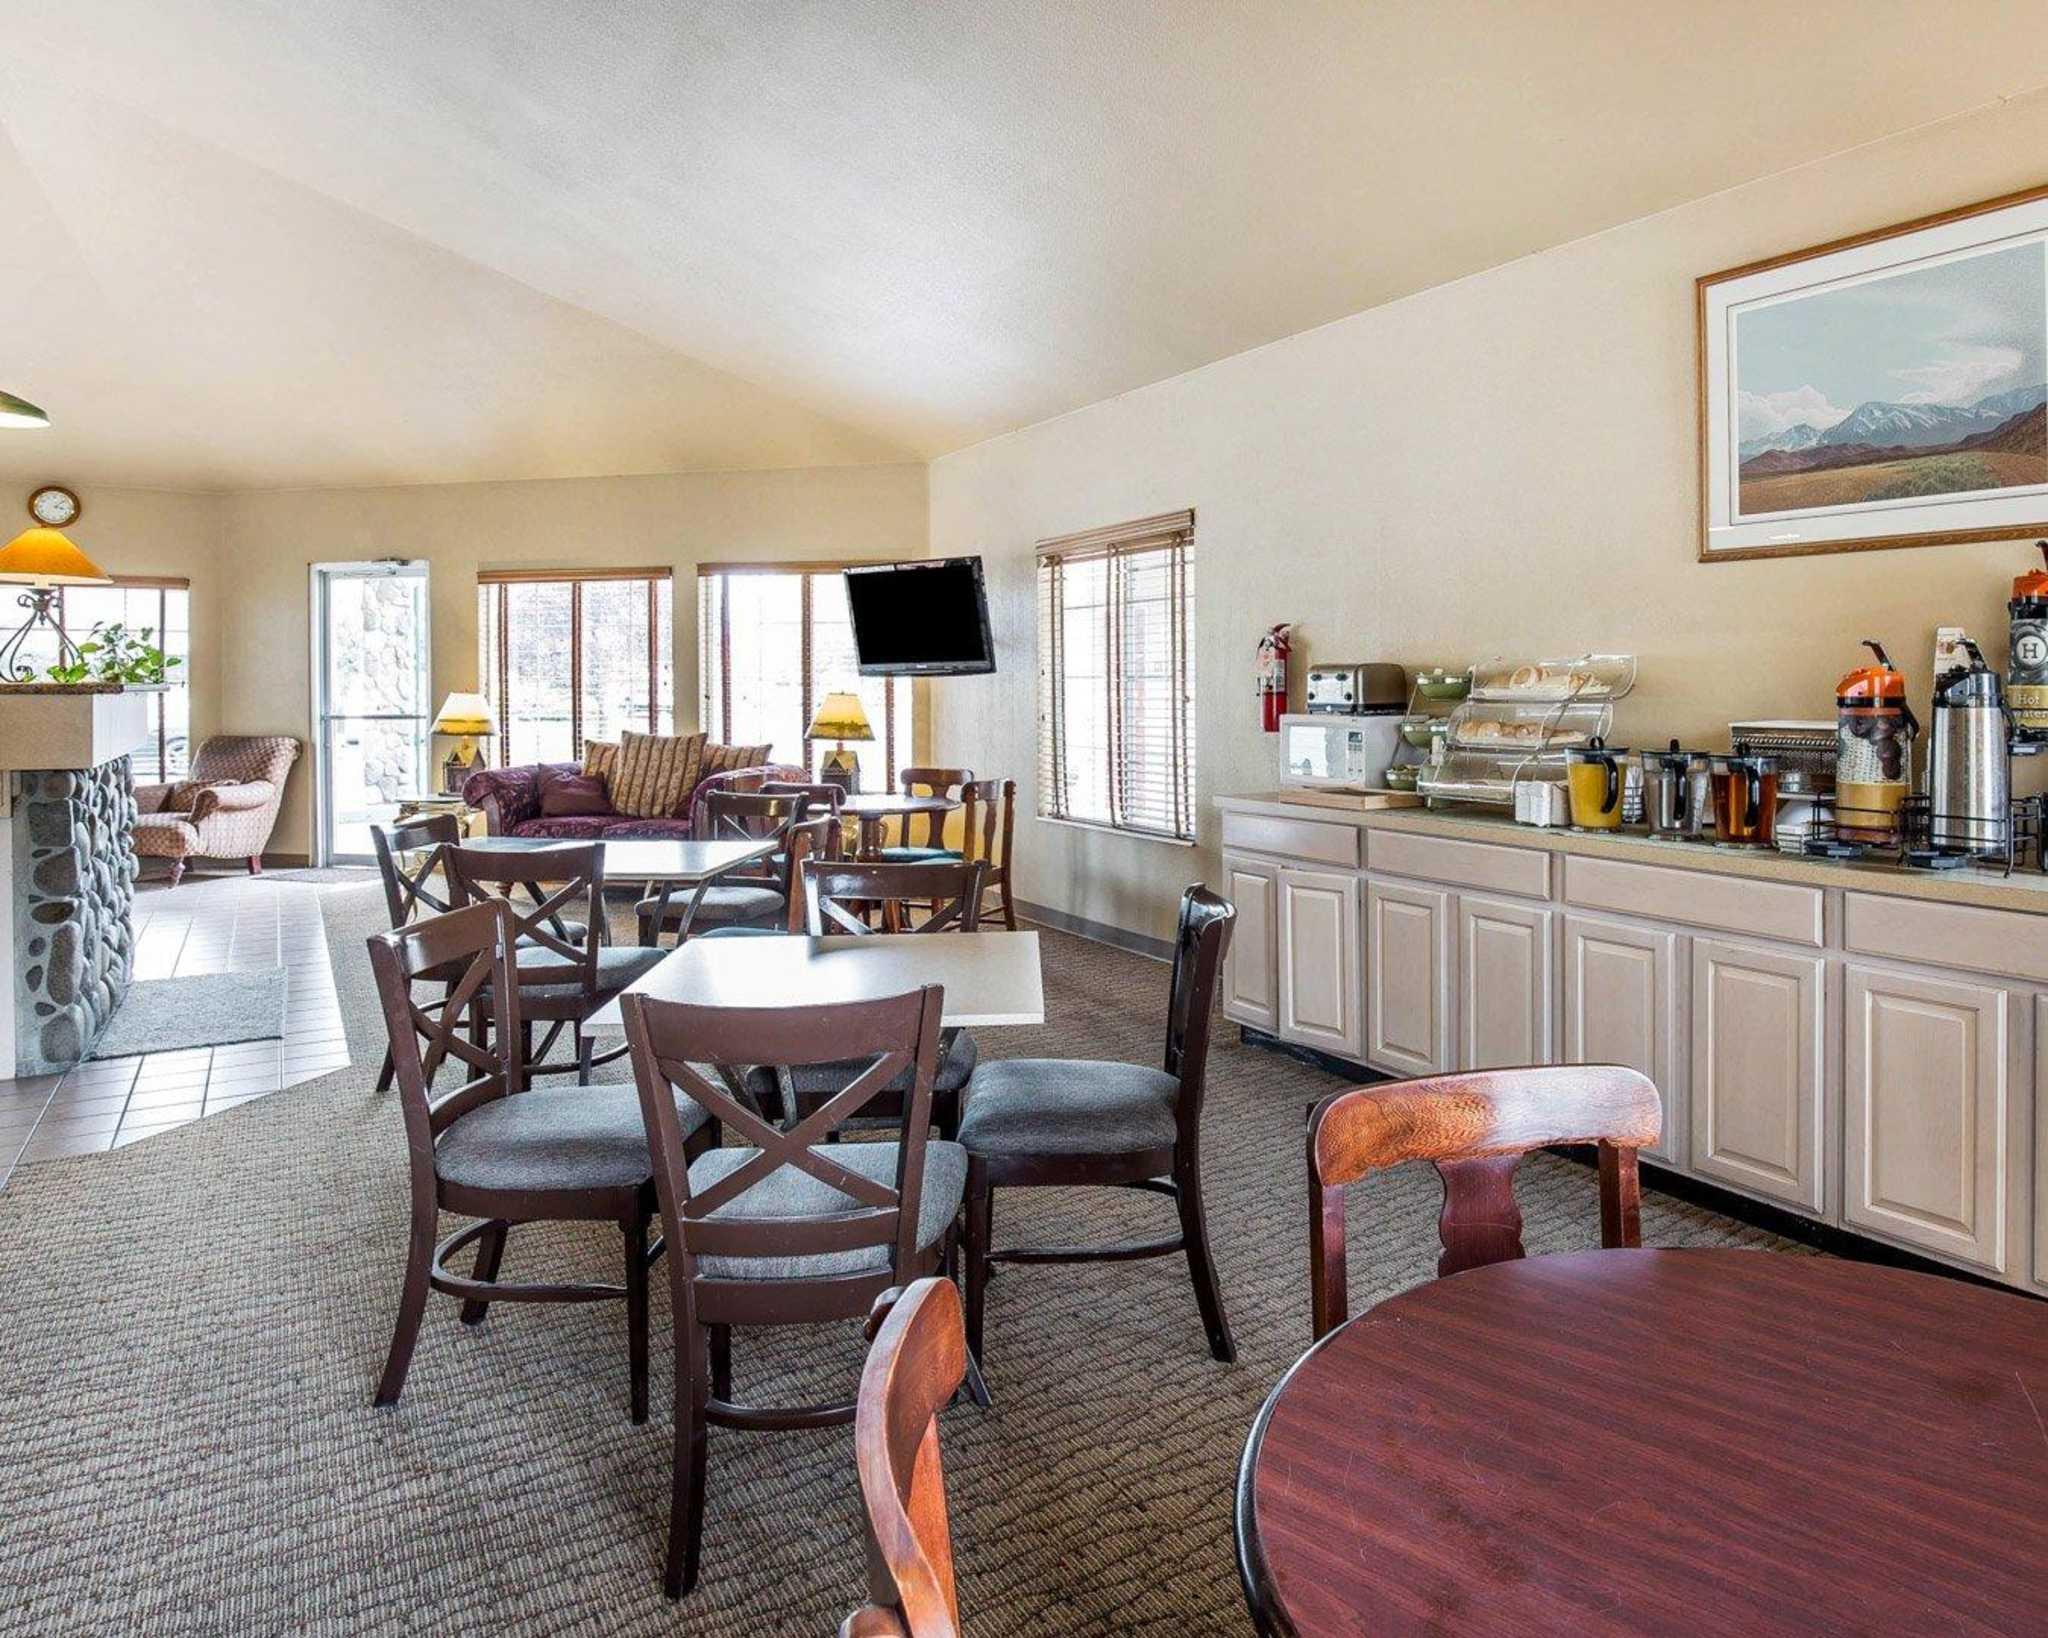 Quality Inn & Suites Minden US-395 image 21